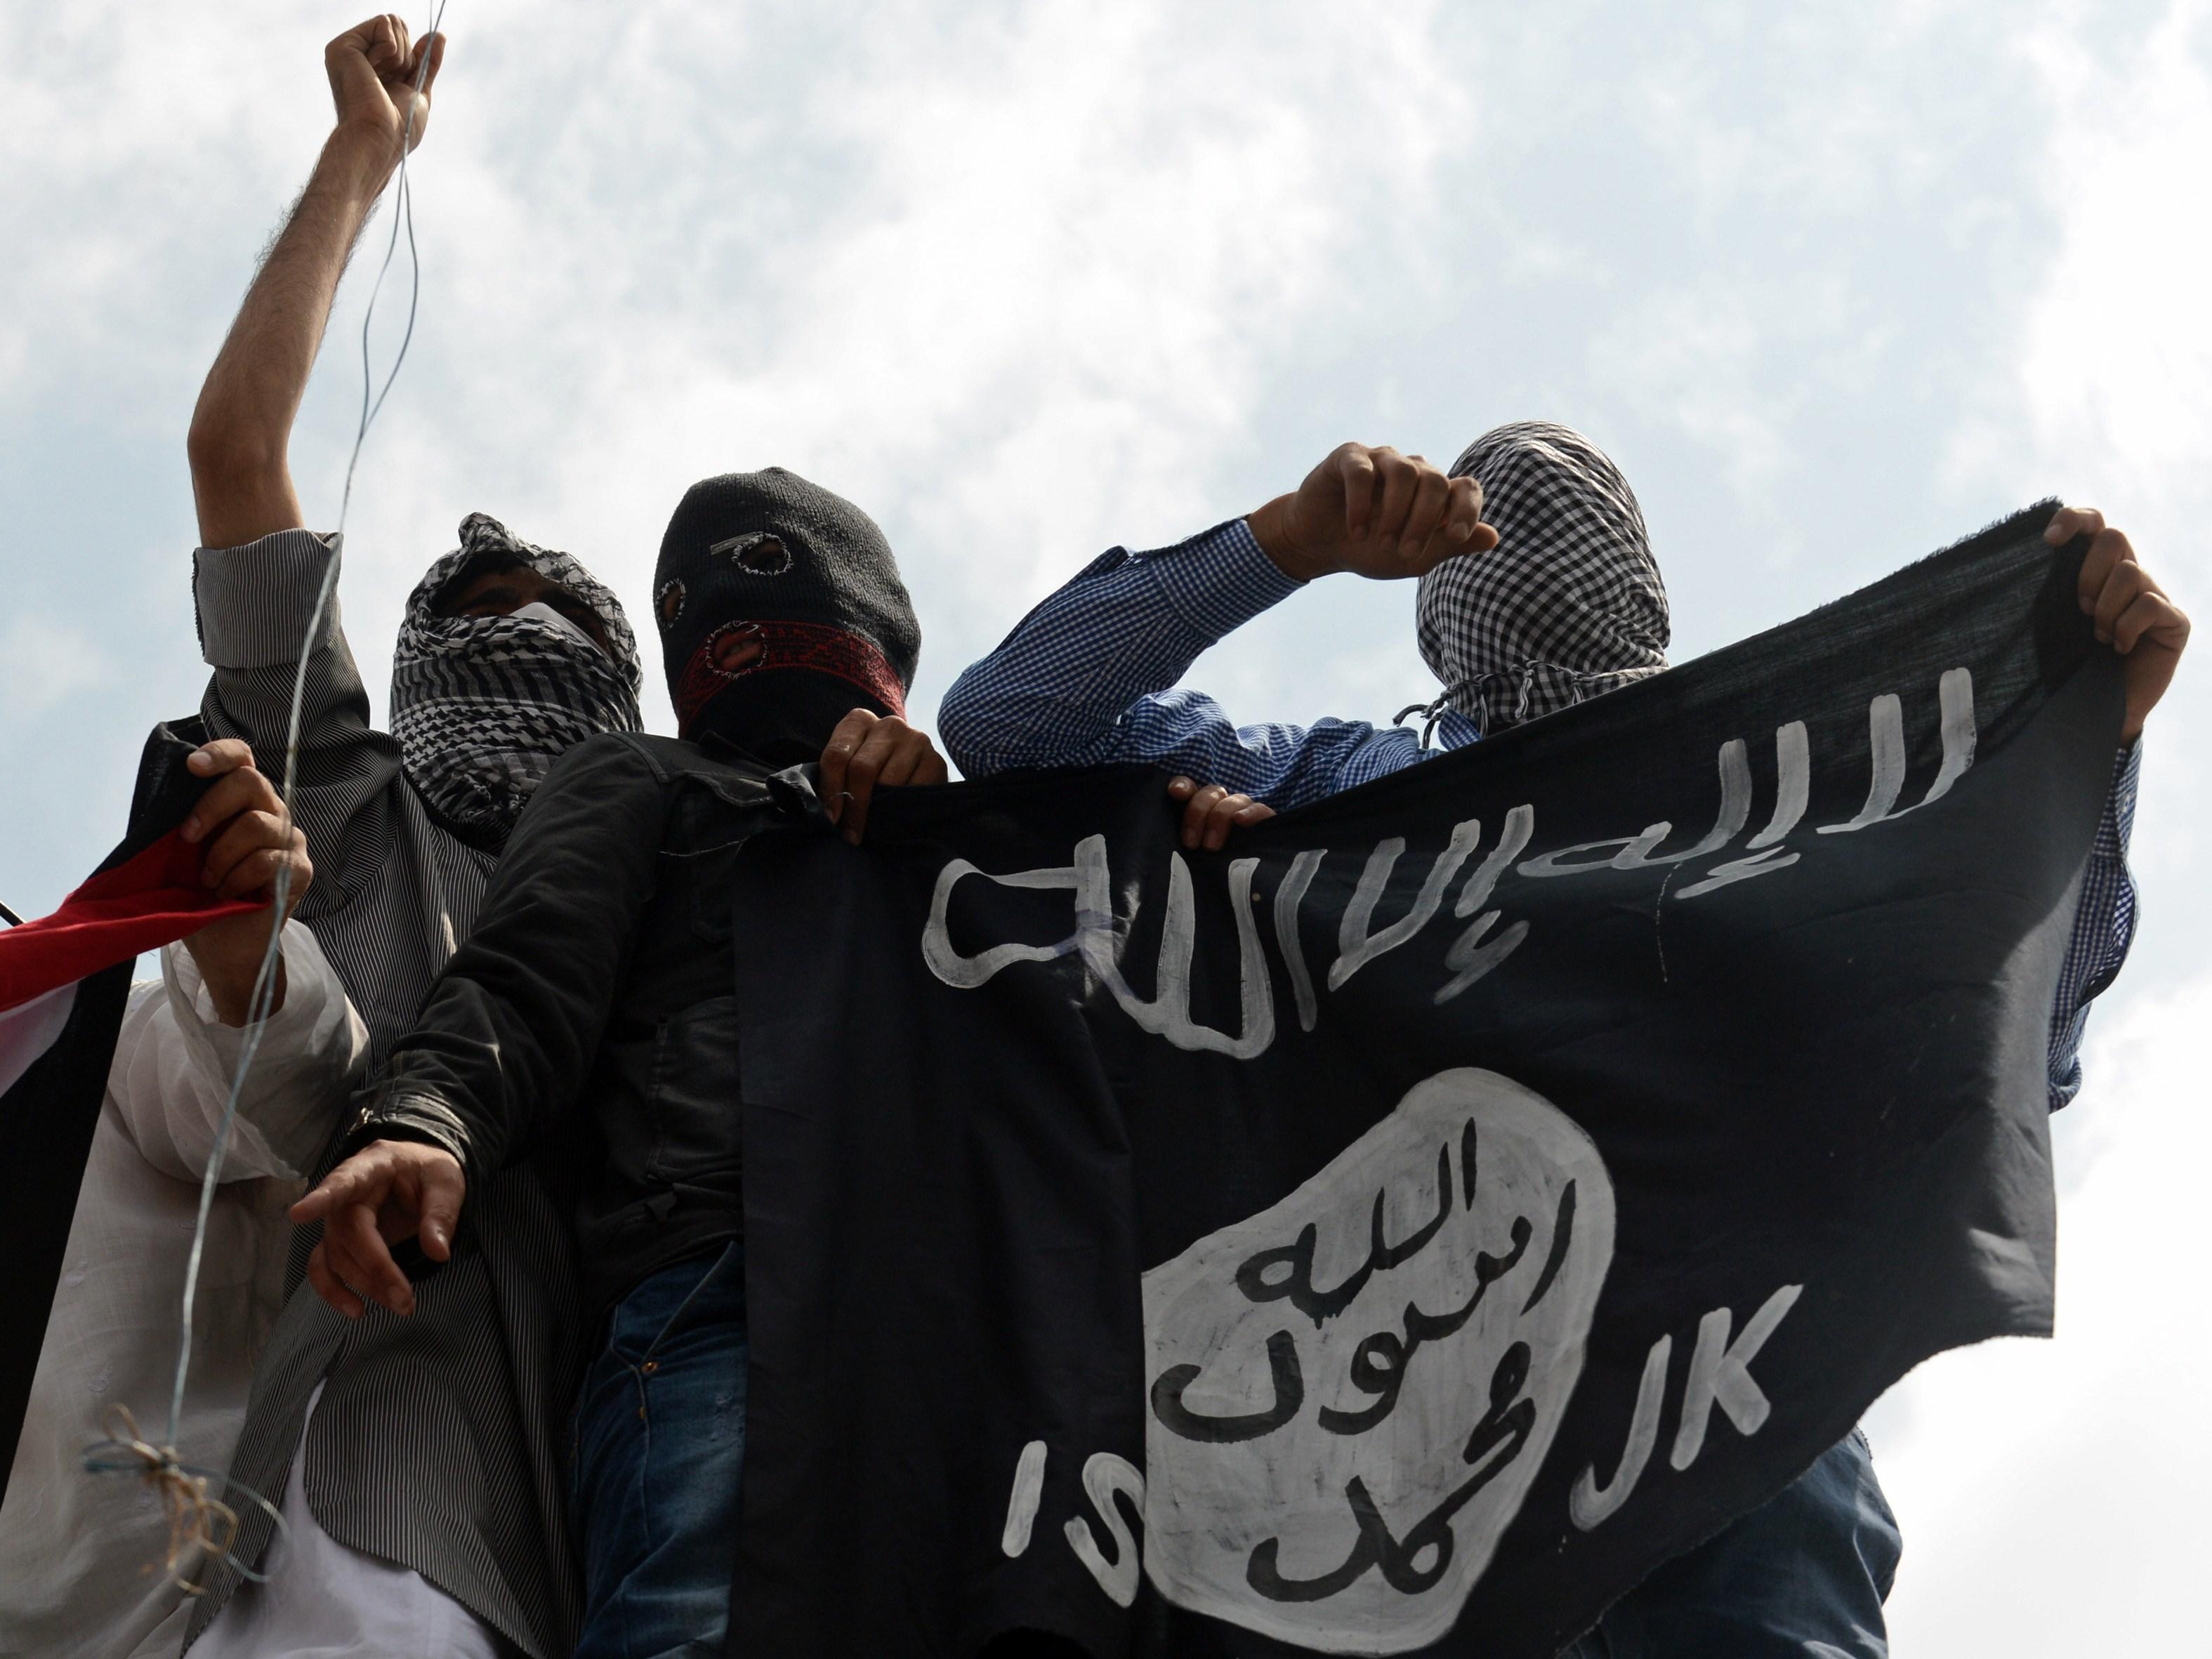 ISIS ermordet Geisel: Muas al-Kasasba bei lebendigem Leib verbrannt